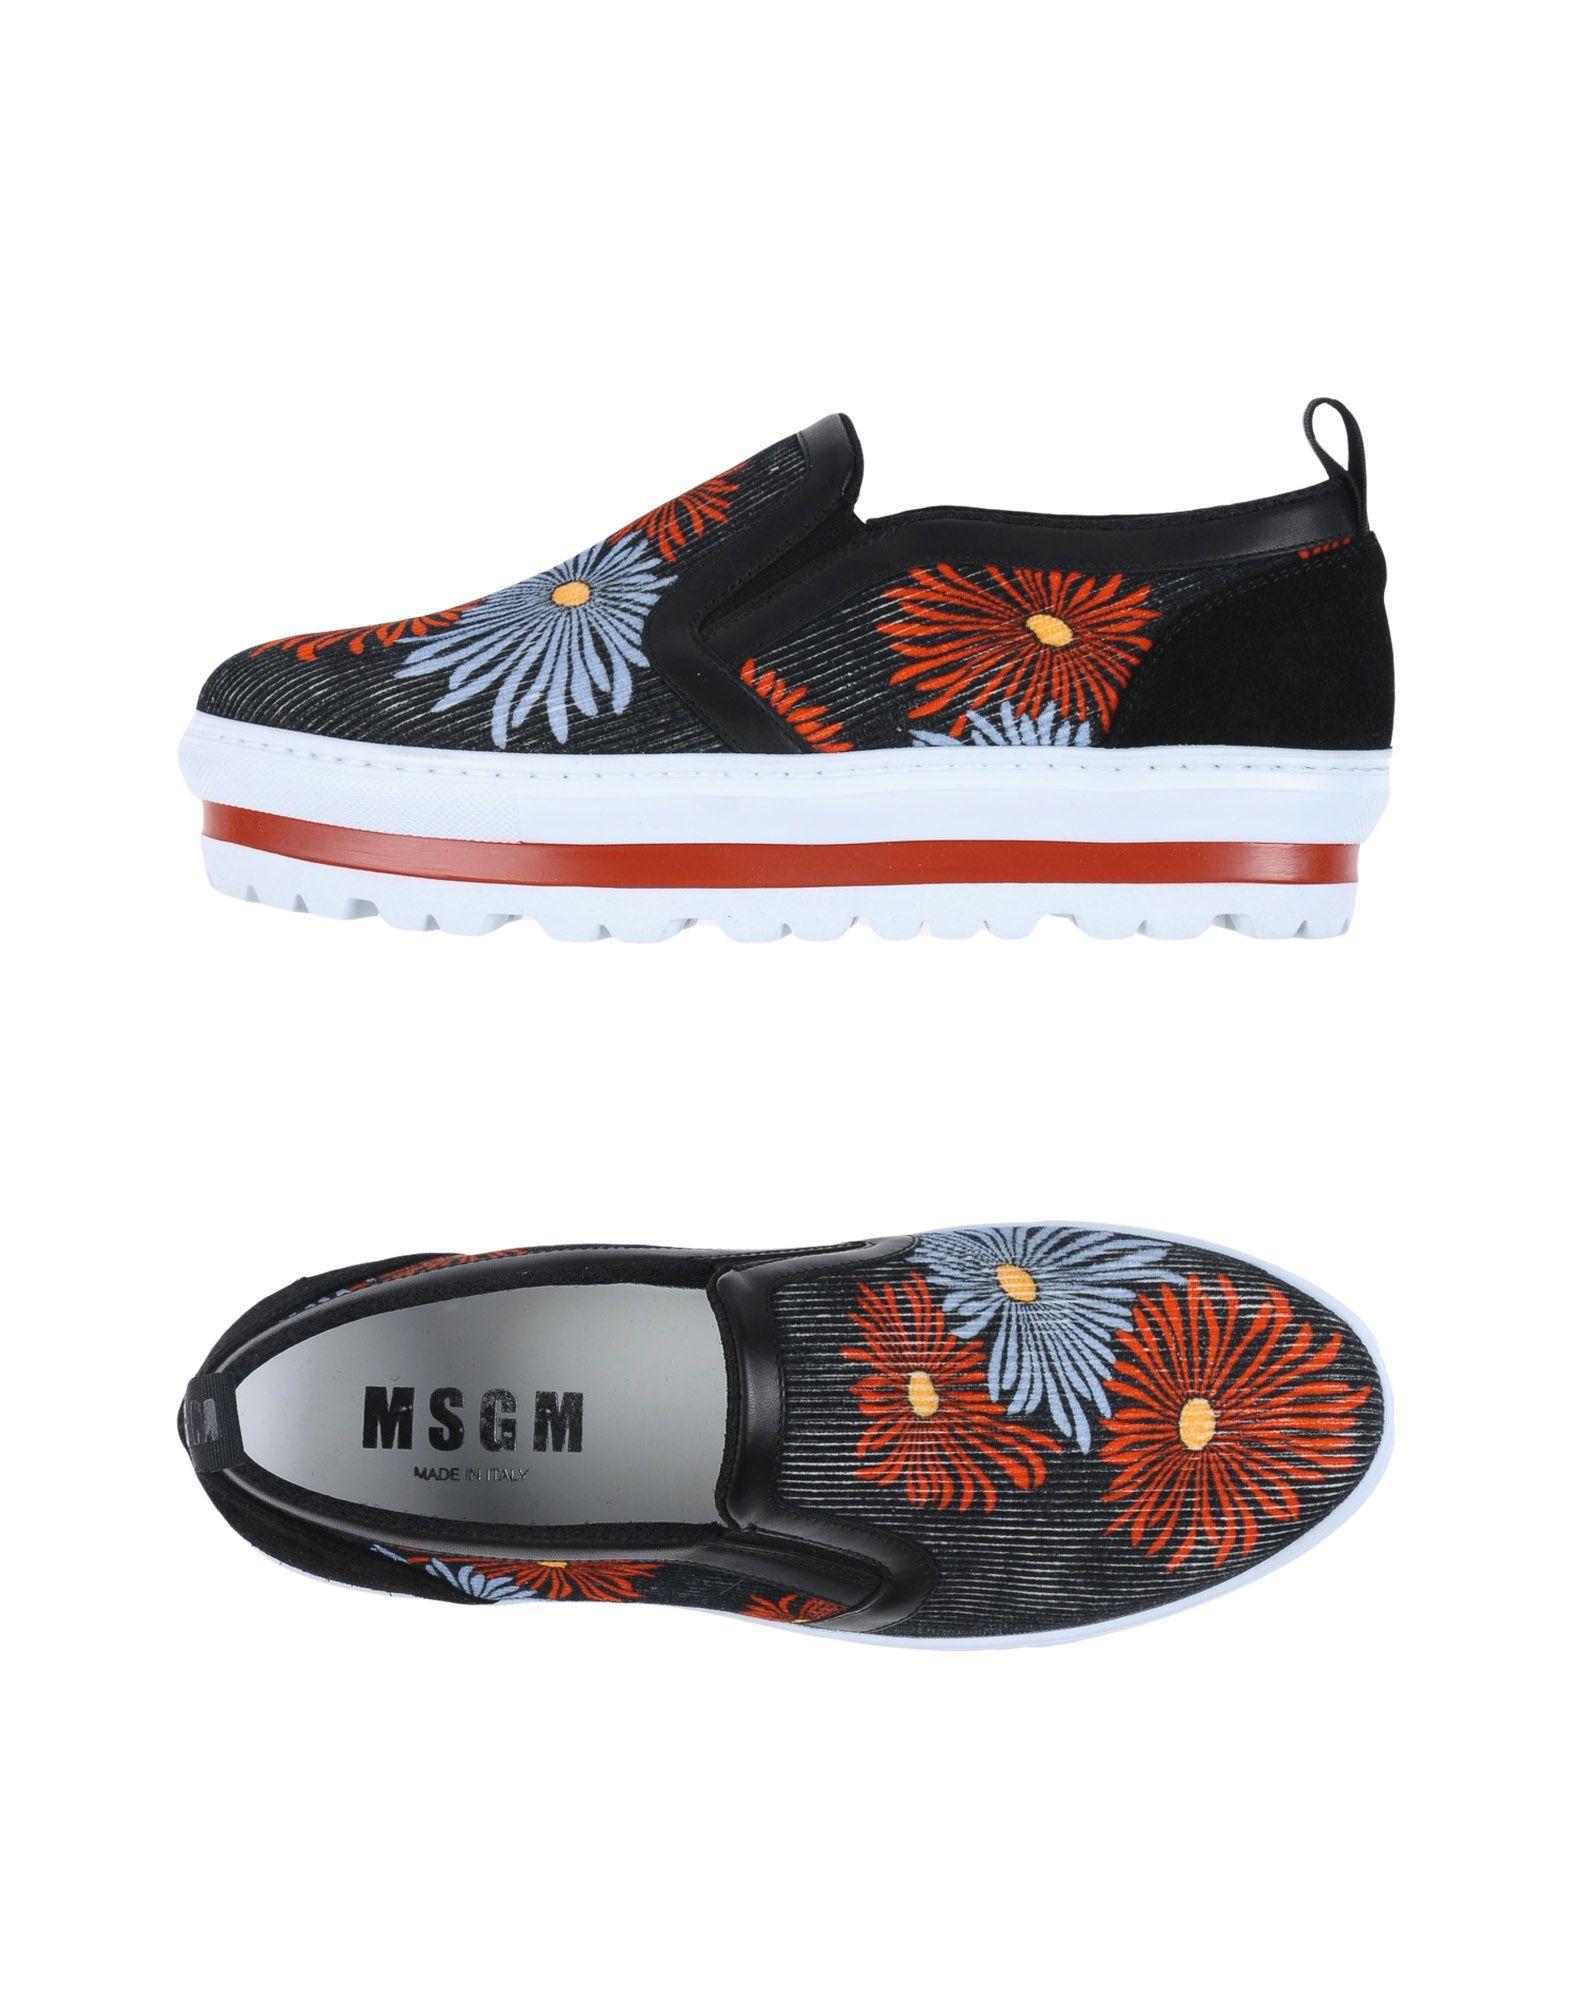 Msgm Sneakers - - - Women Msgm Sneakers online on  United Kingdom - 11254805GV 1cf04e